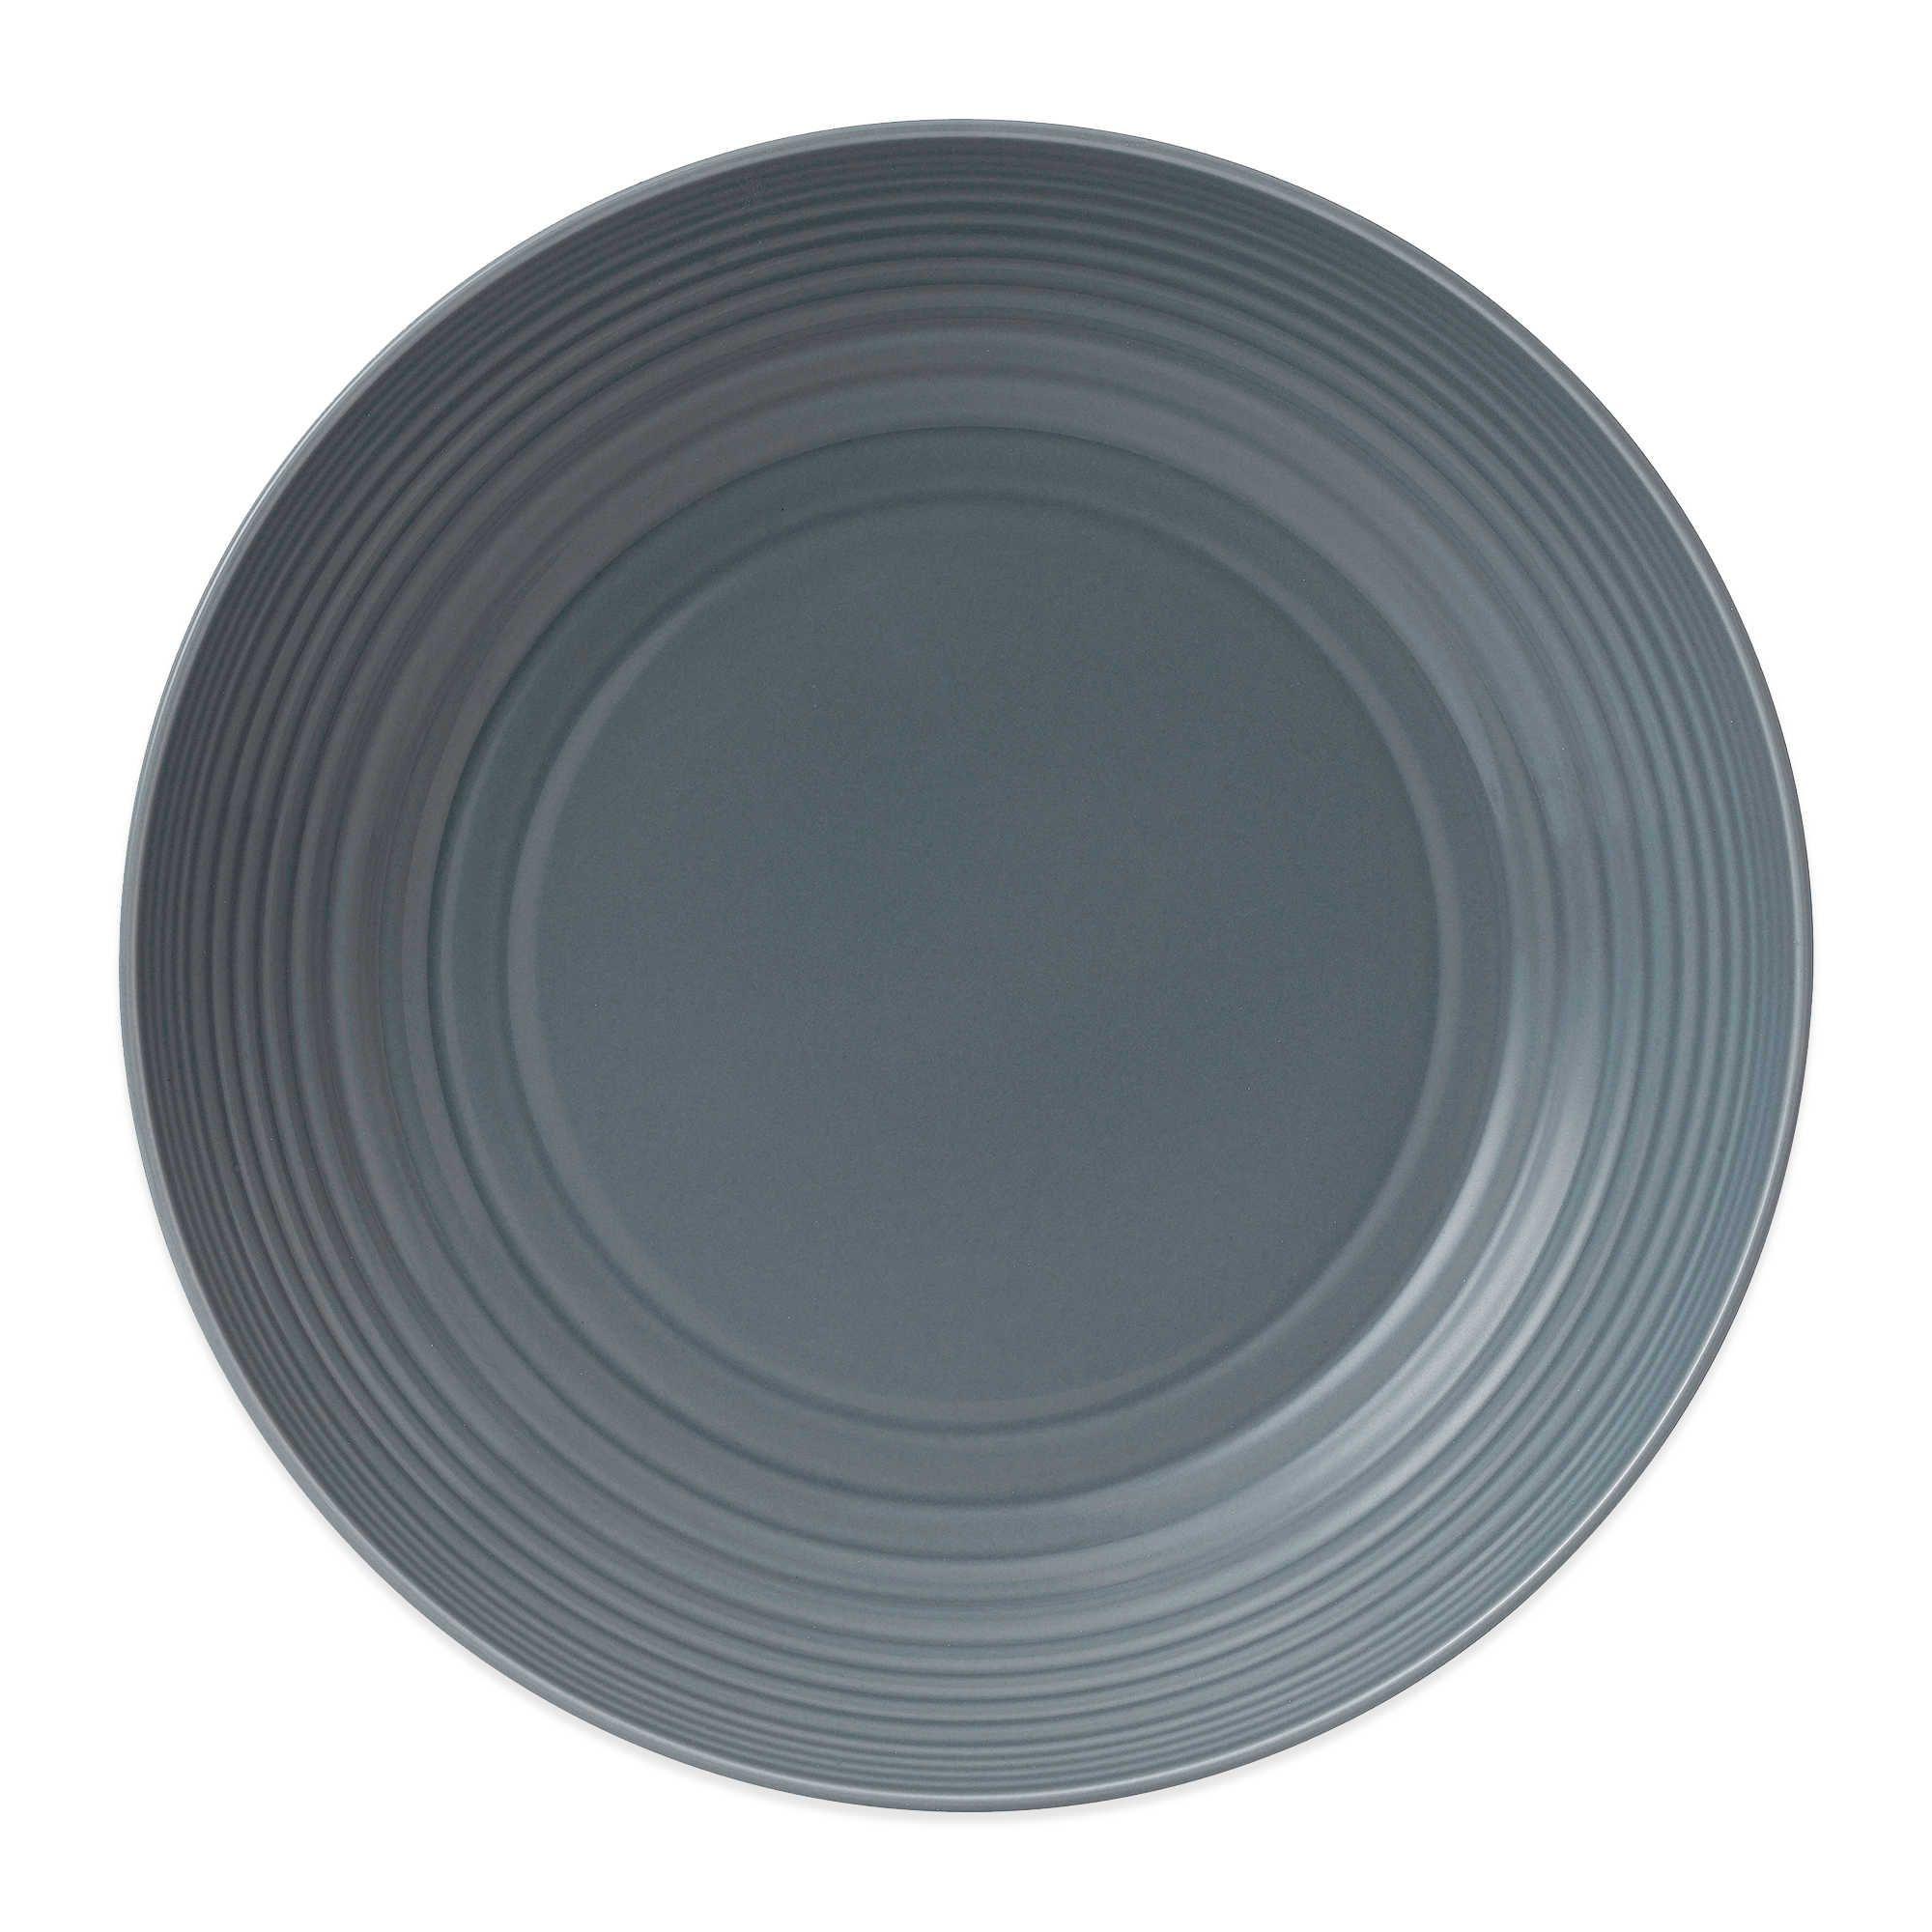 Gordon Ramsay by Royal Doulton® Maze Serving Bowl in Dark Grey